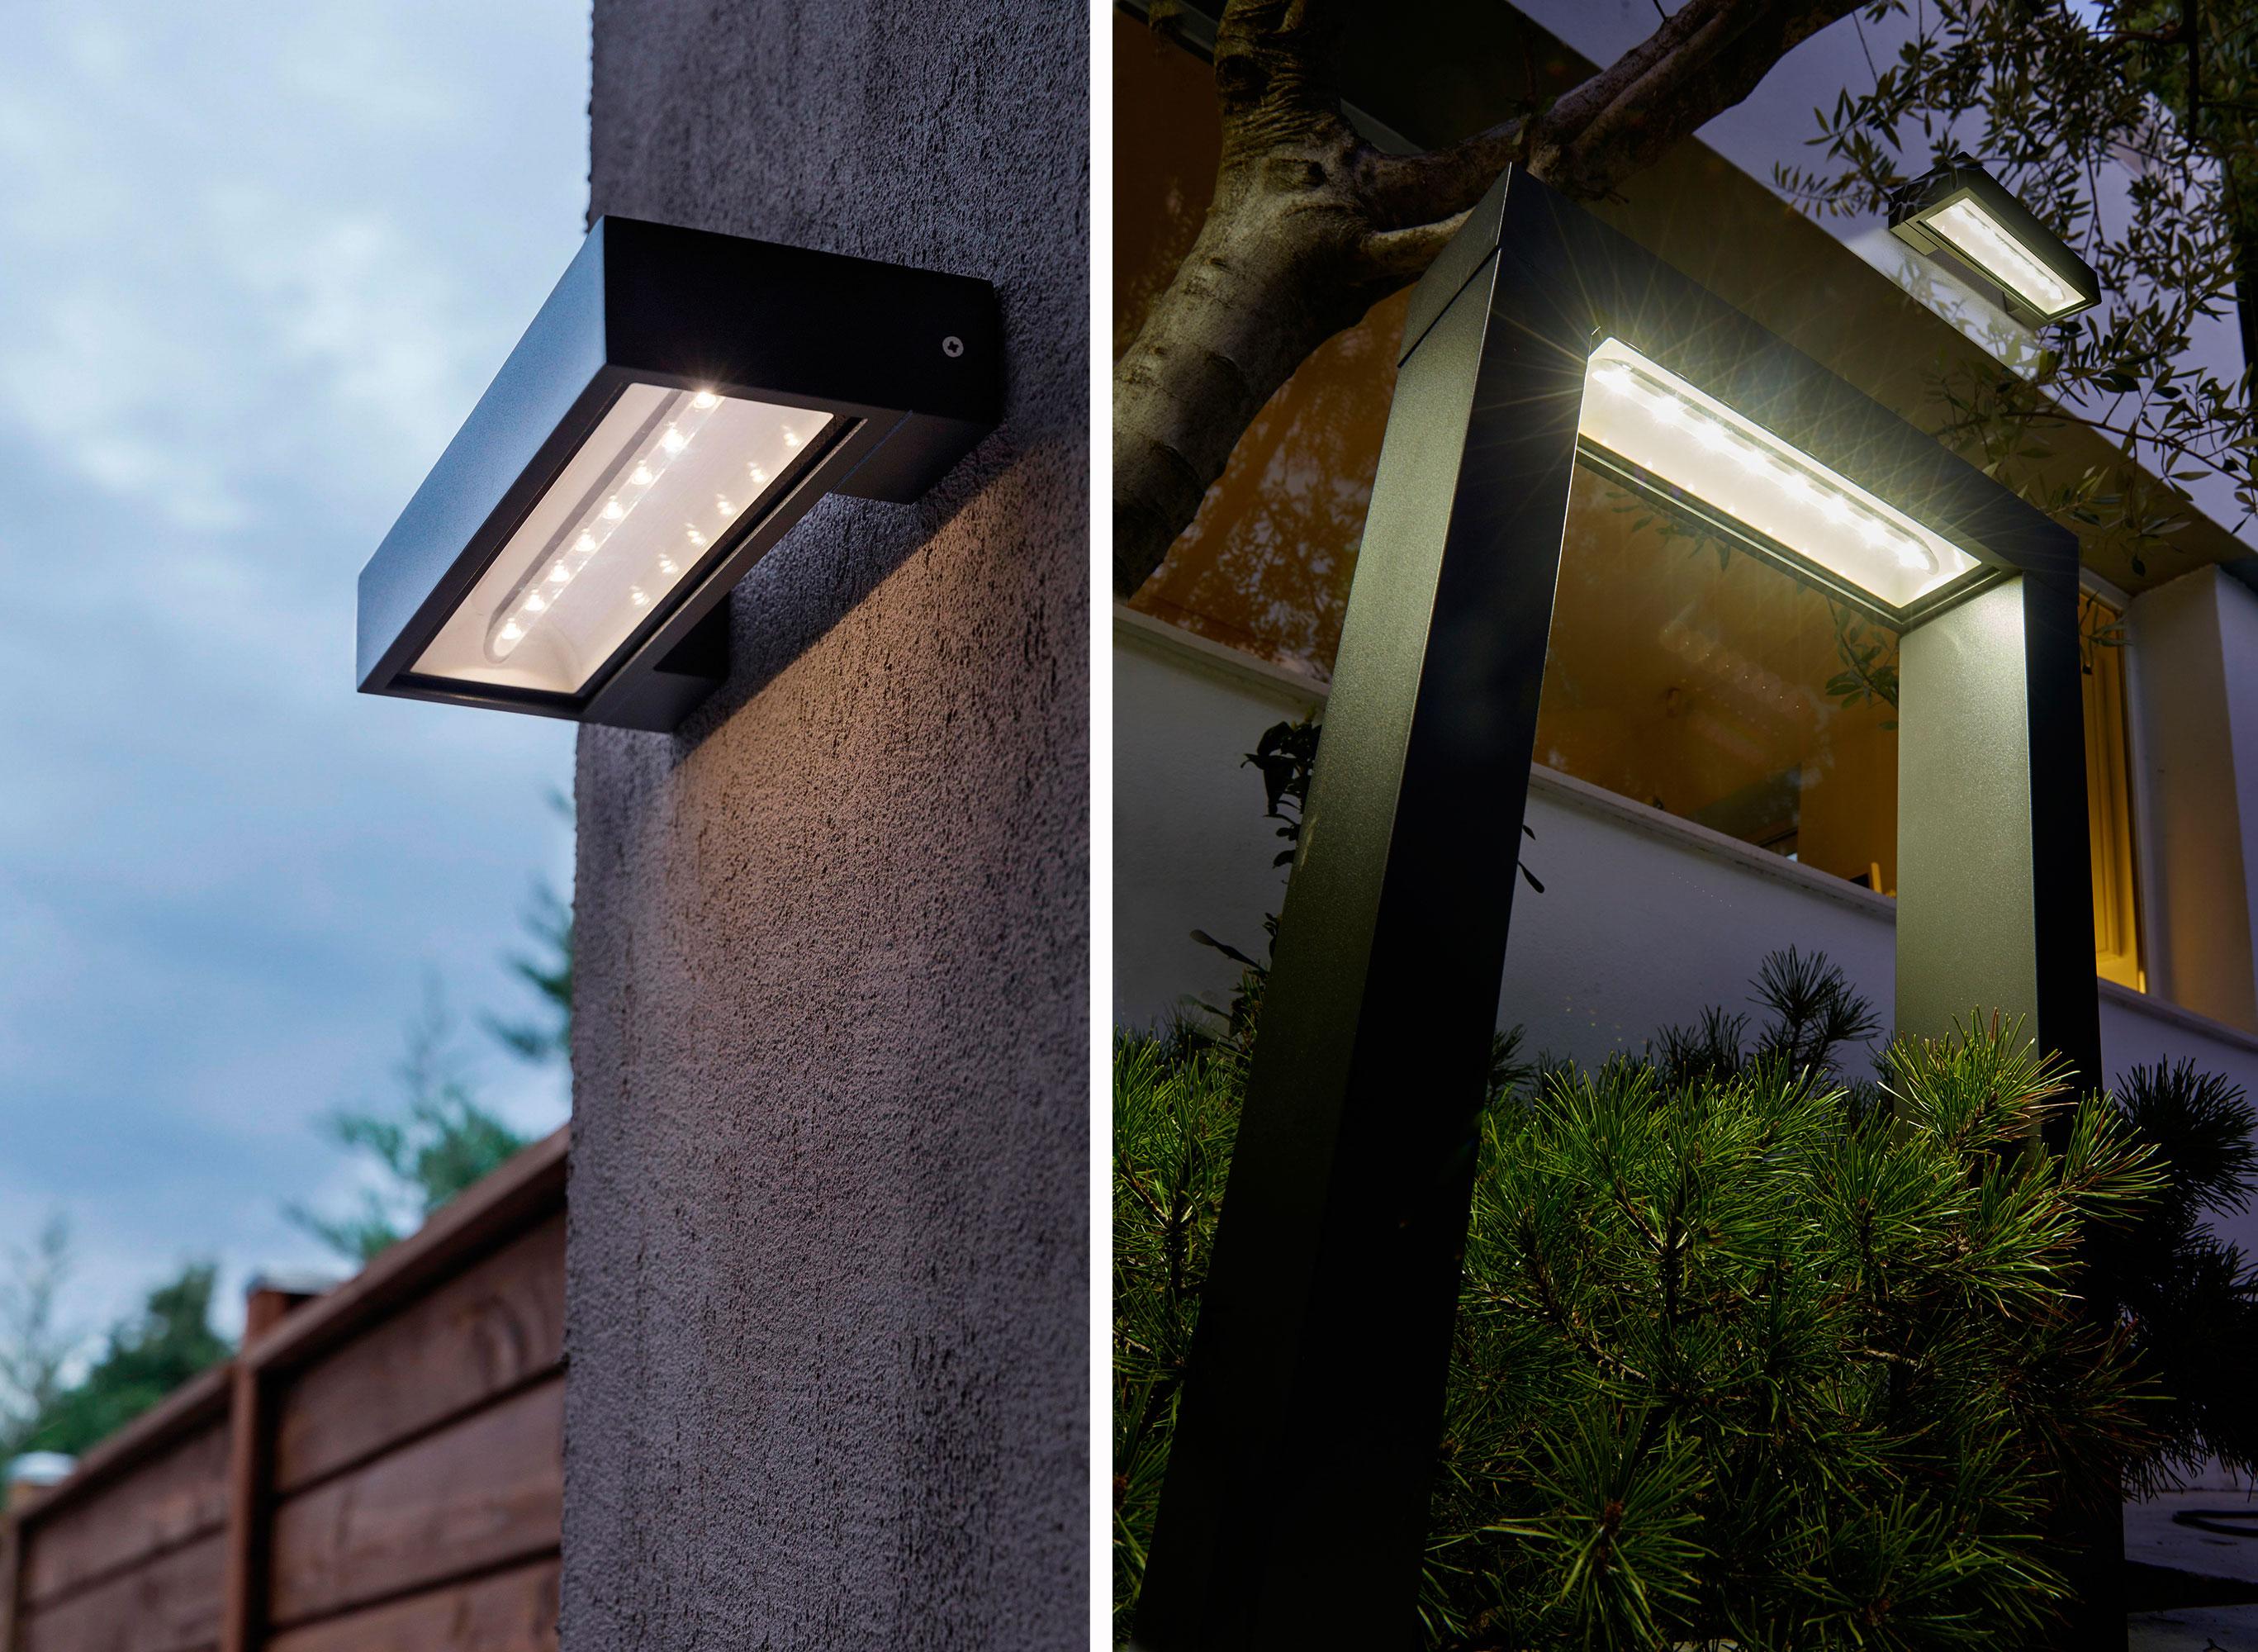 C mo elegir l mparas solares para iluminar el exterior for Lampara solar pared exterior